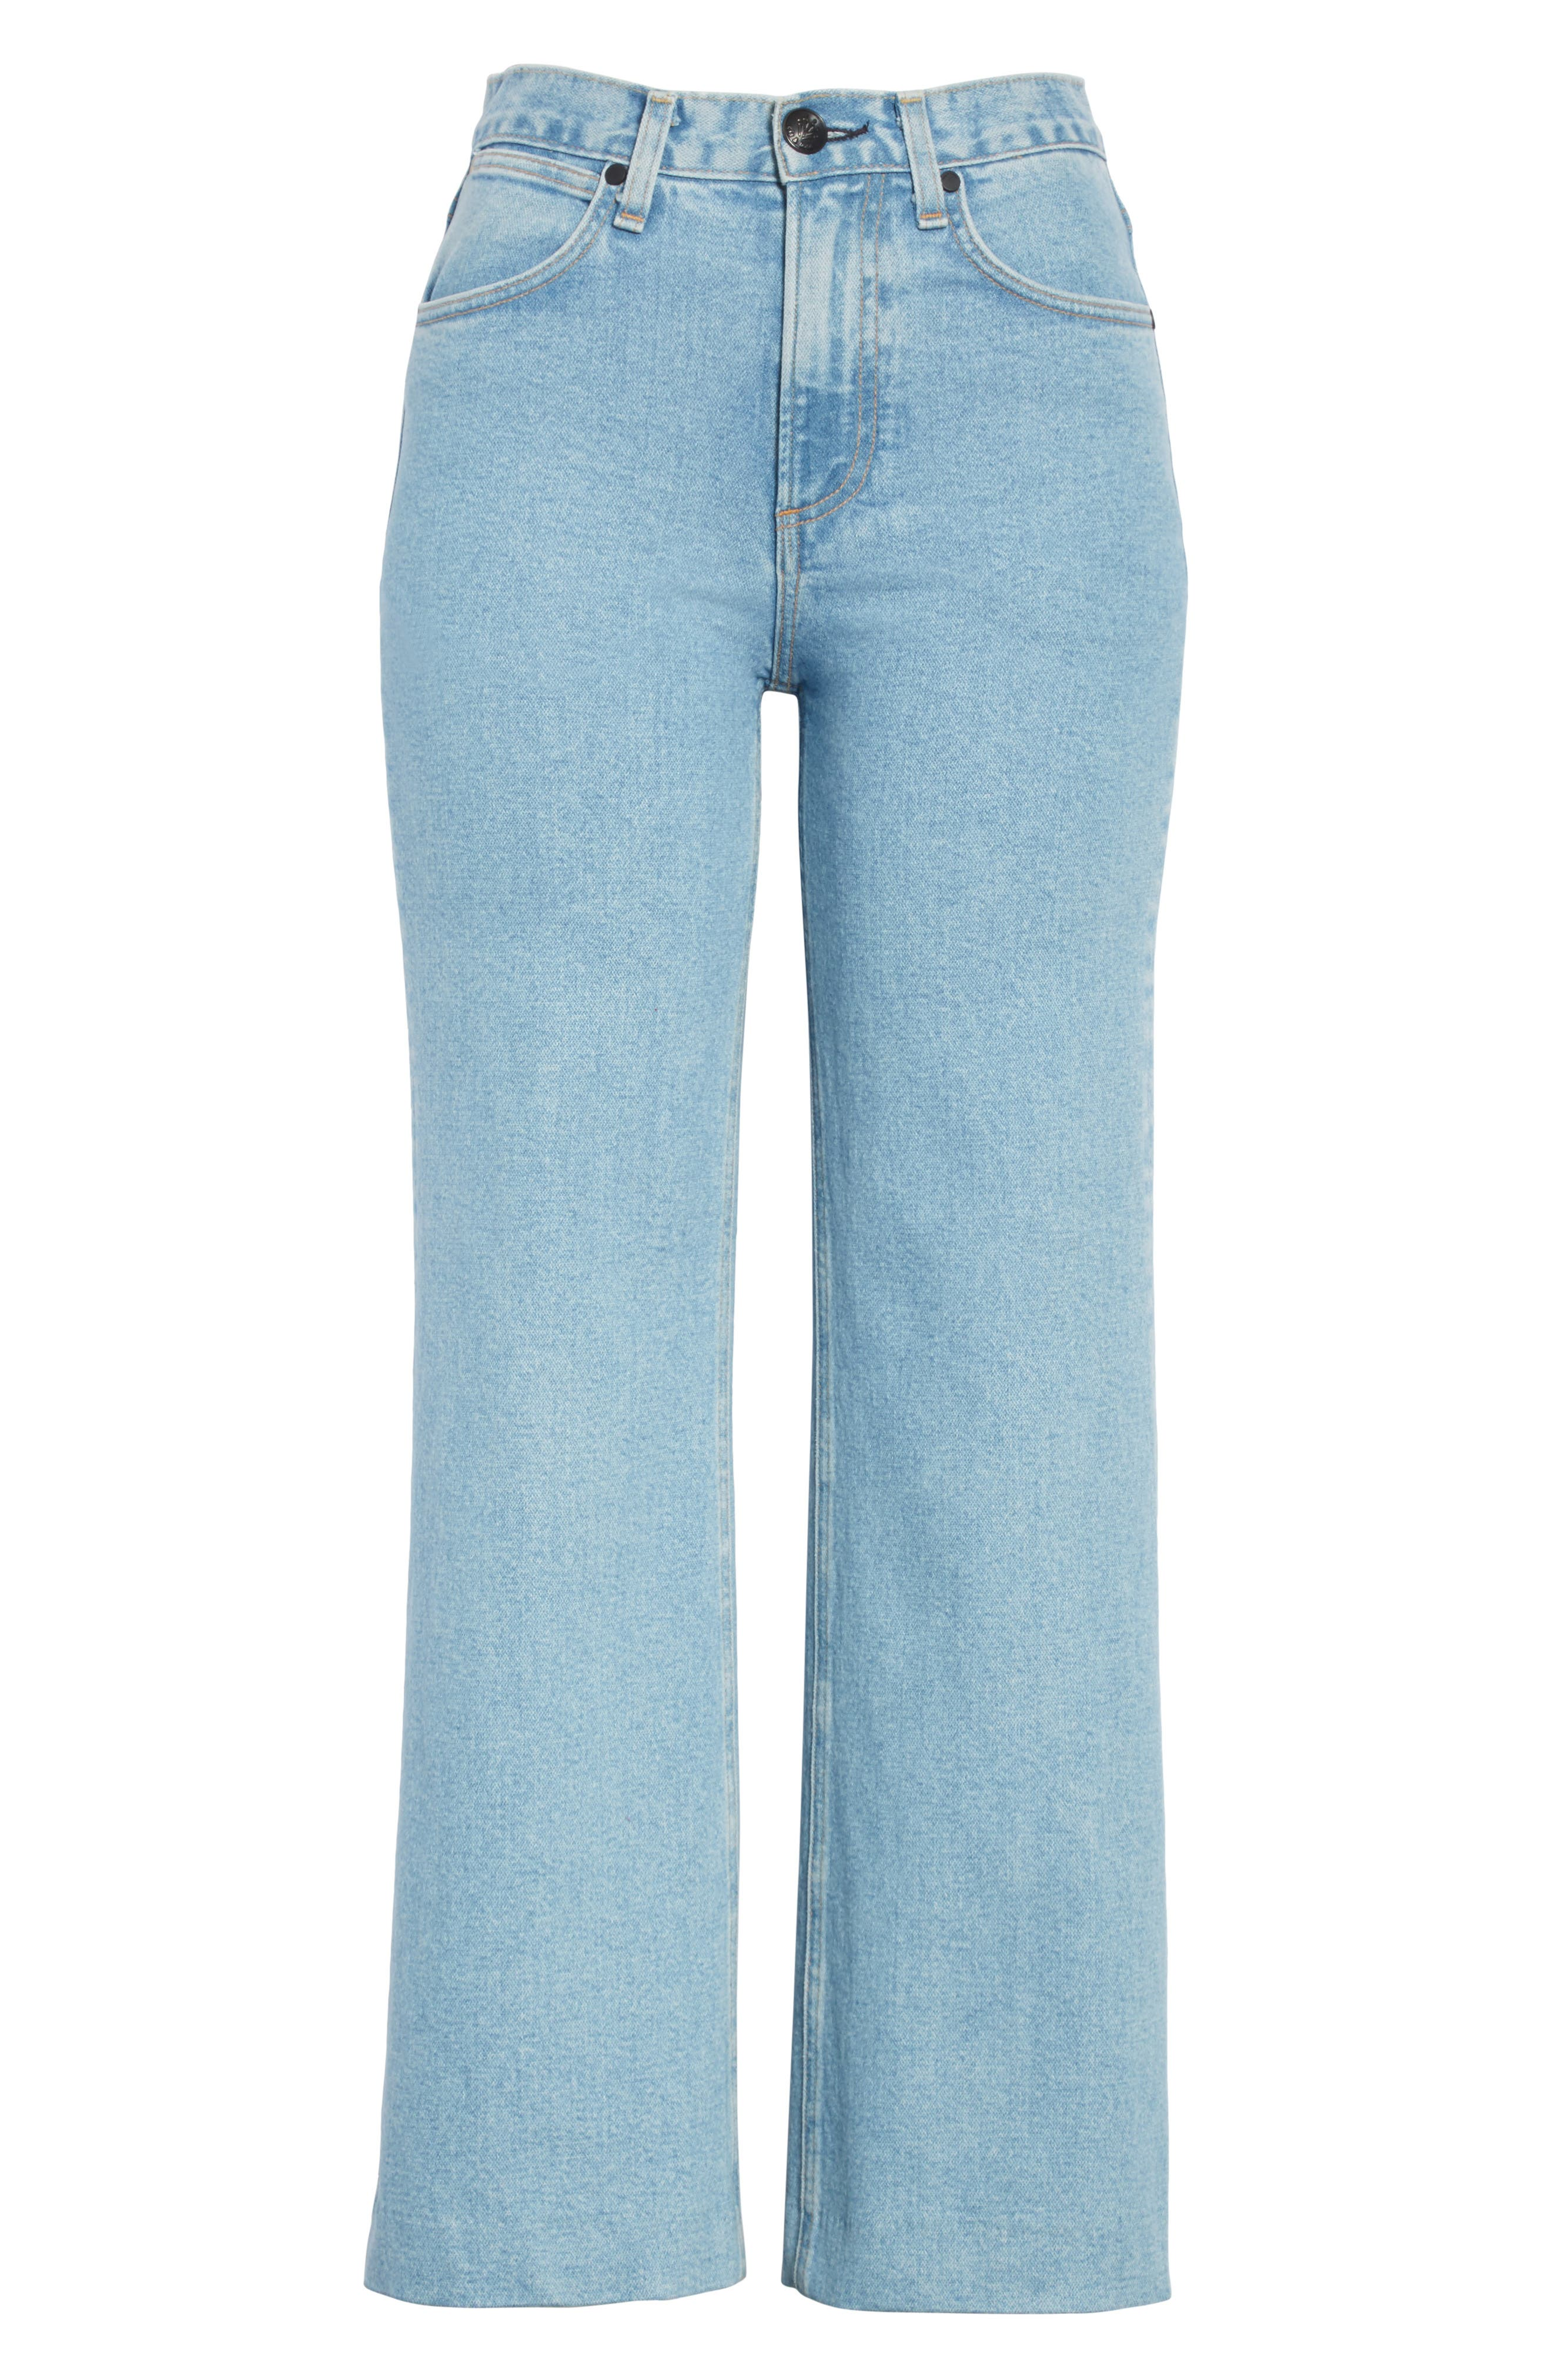 Justine High Waist Wide Leg Trouser Jeans,                             Alternate thumbnail 6, color,                             Broken Nelly